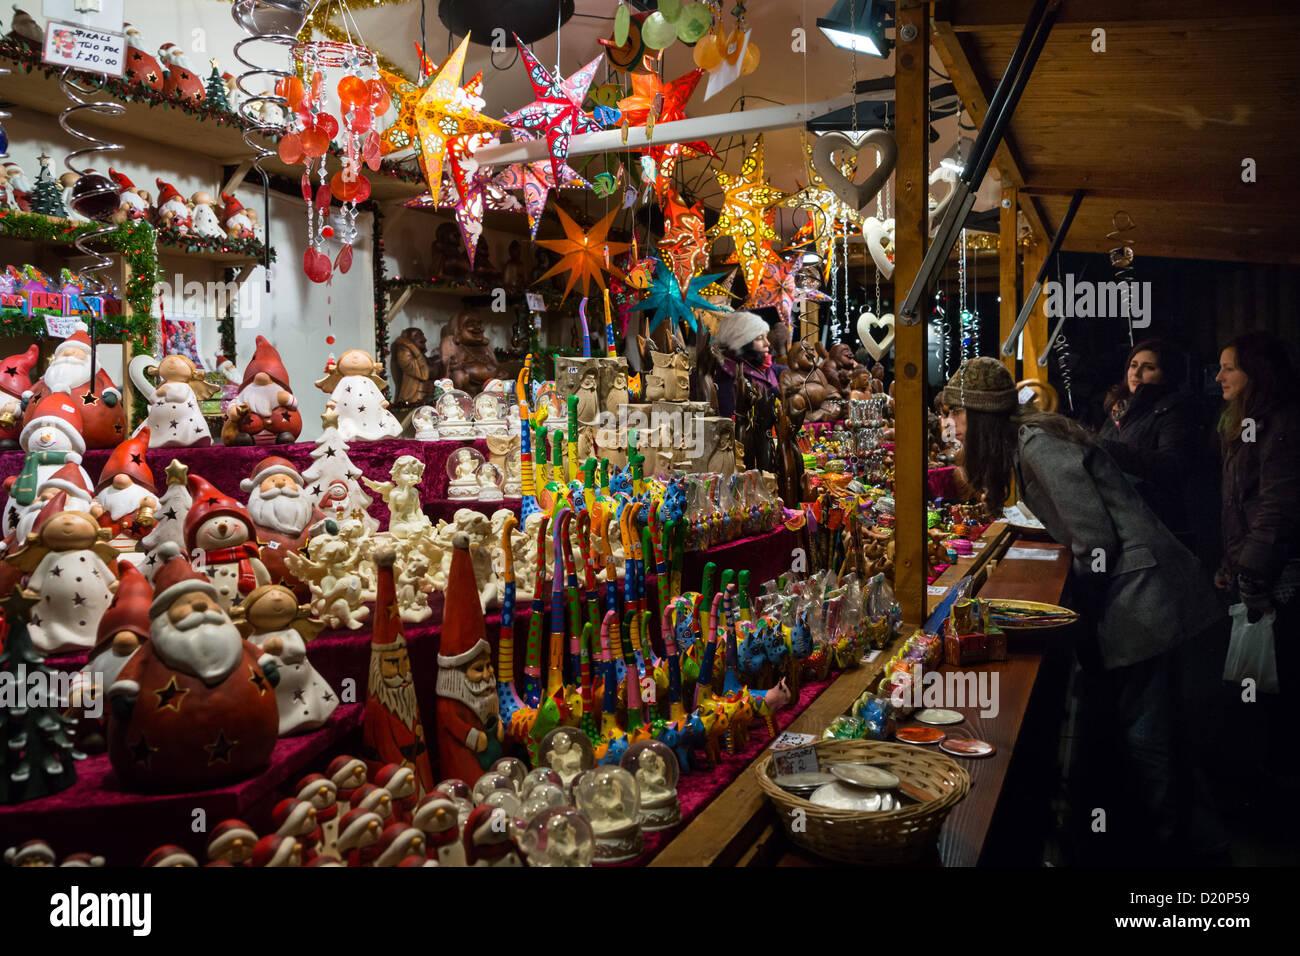 Edinburgh Christmas Market Stock Photos & Edinburgh Christmas ...